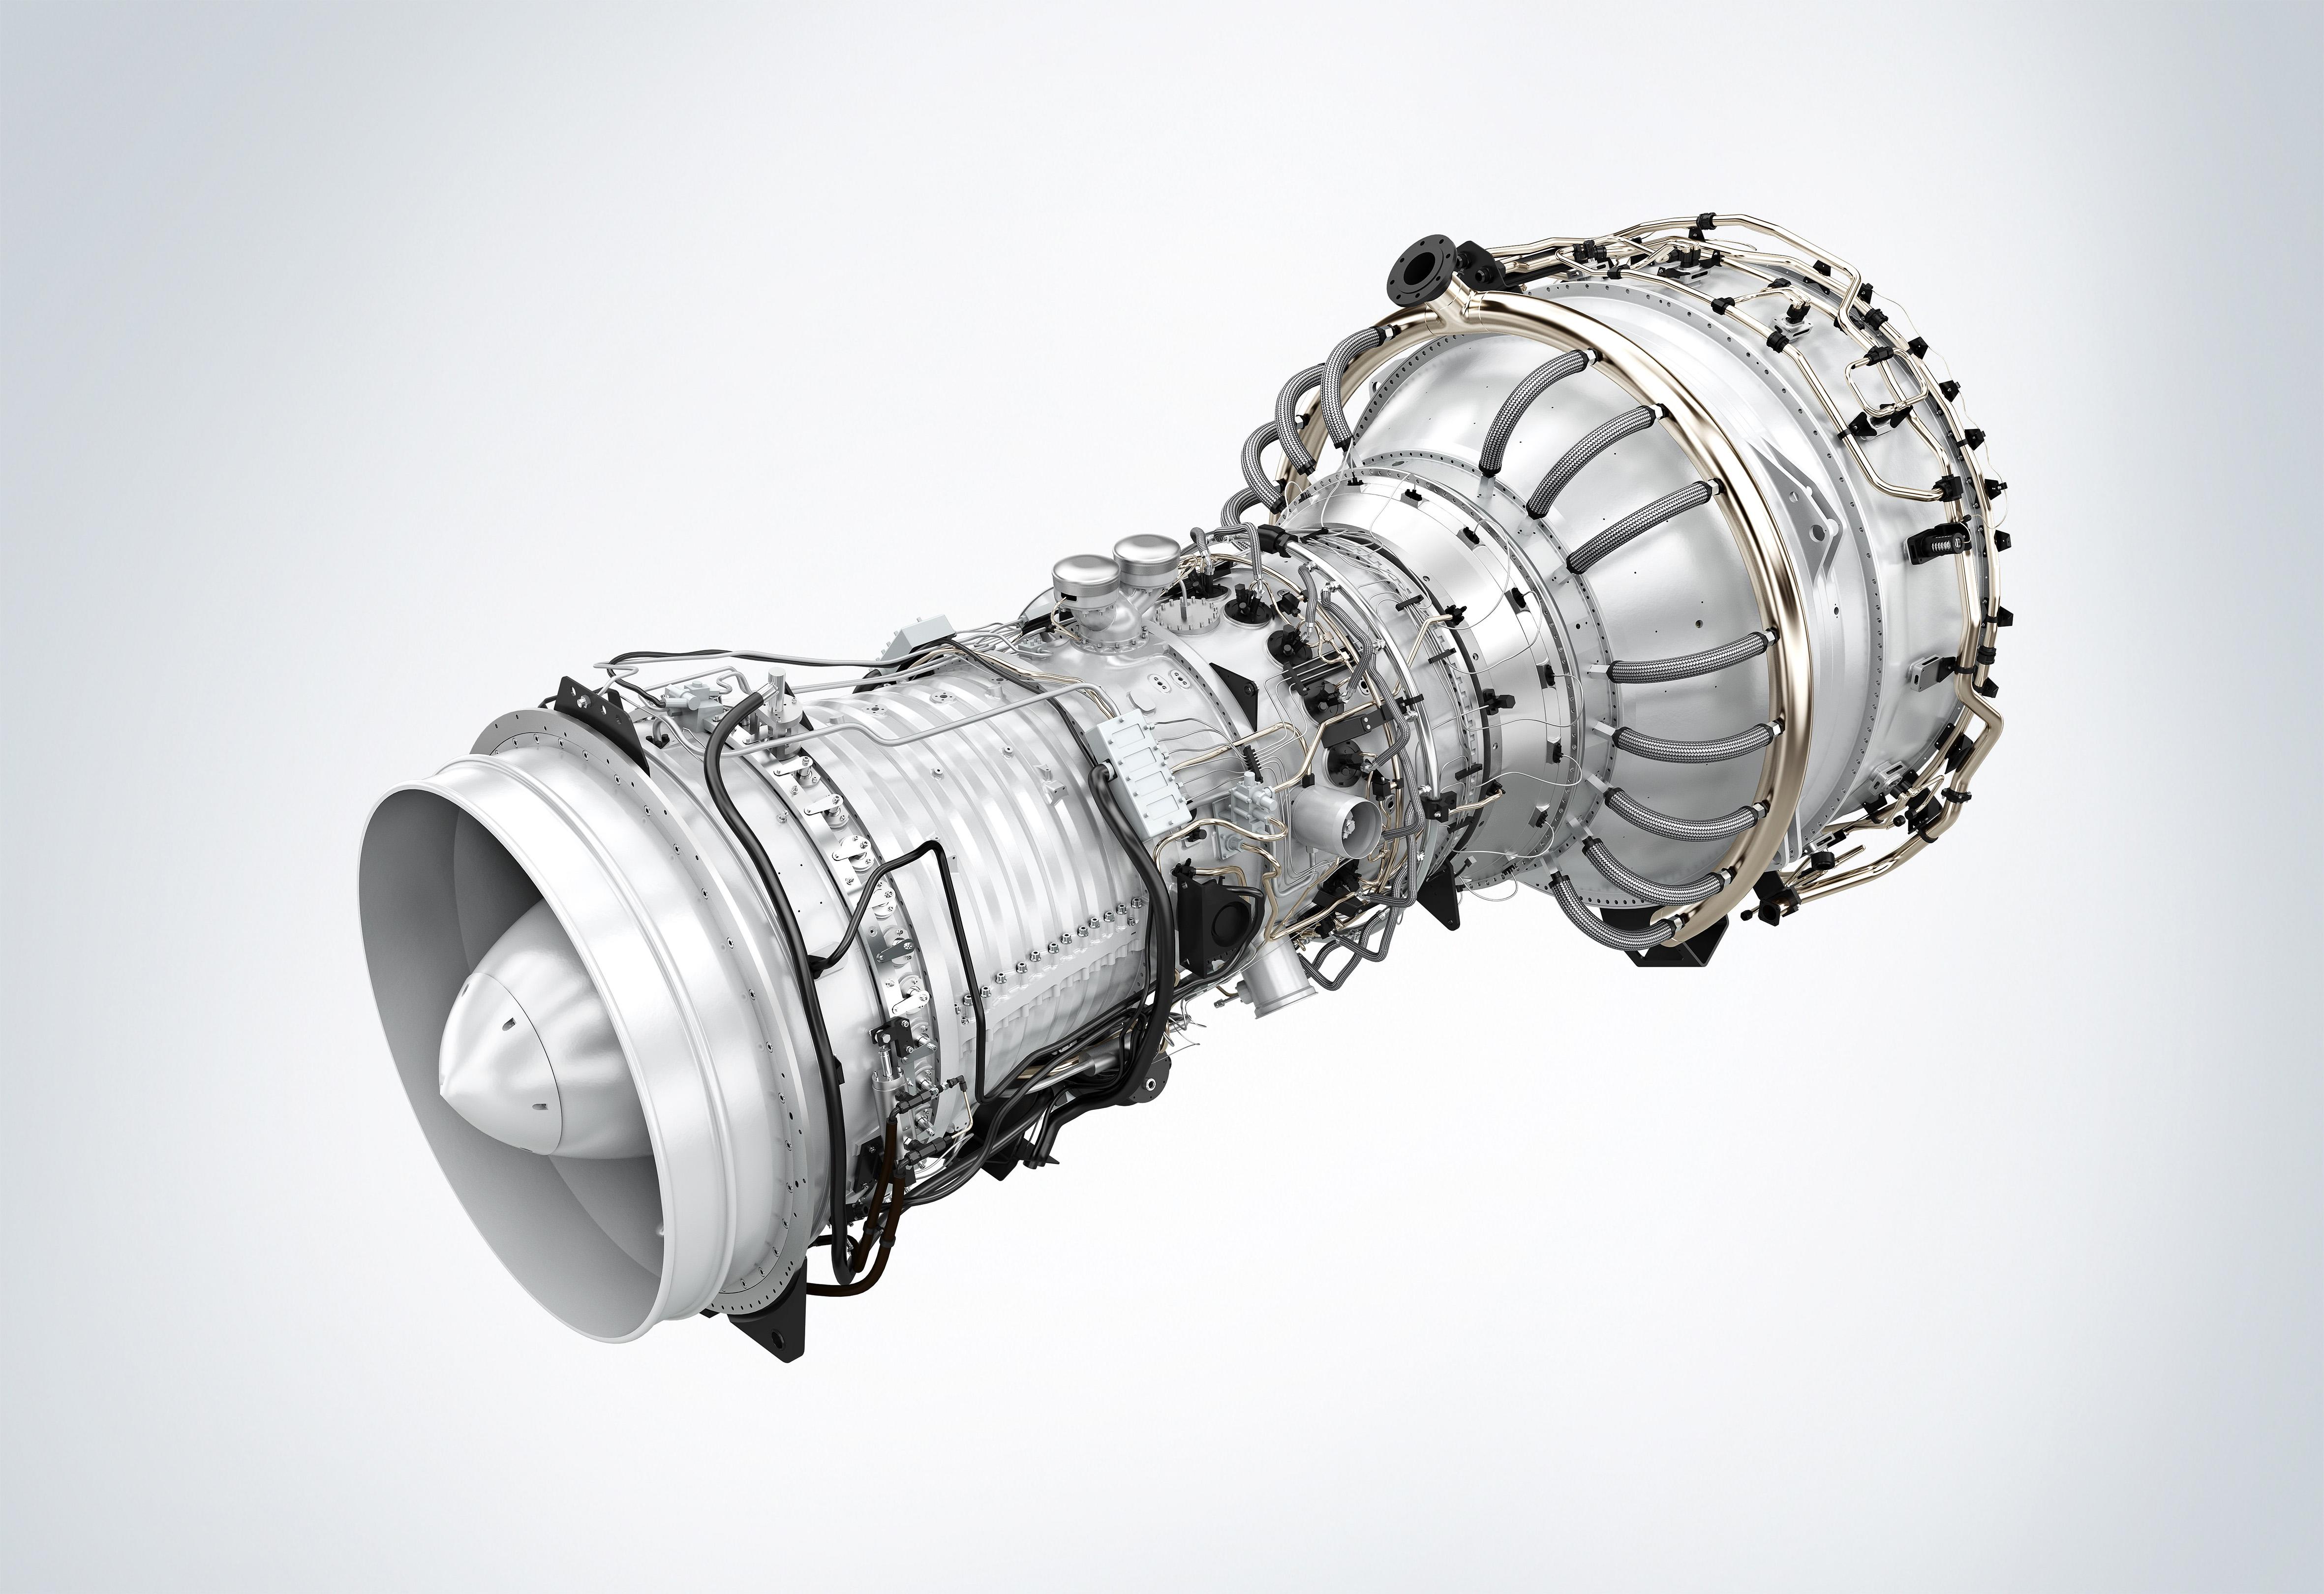 Siemens Presents New Lightweight Aero Derivative Gas Turbine for